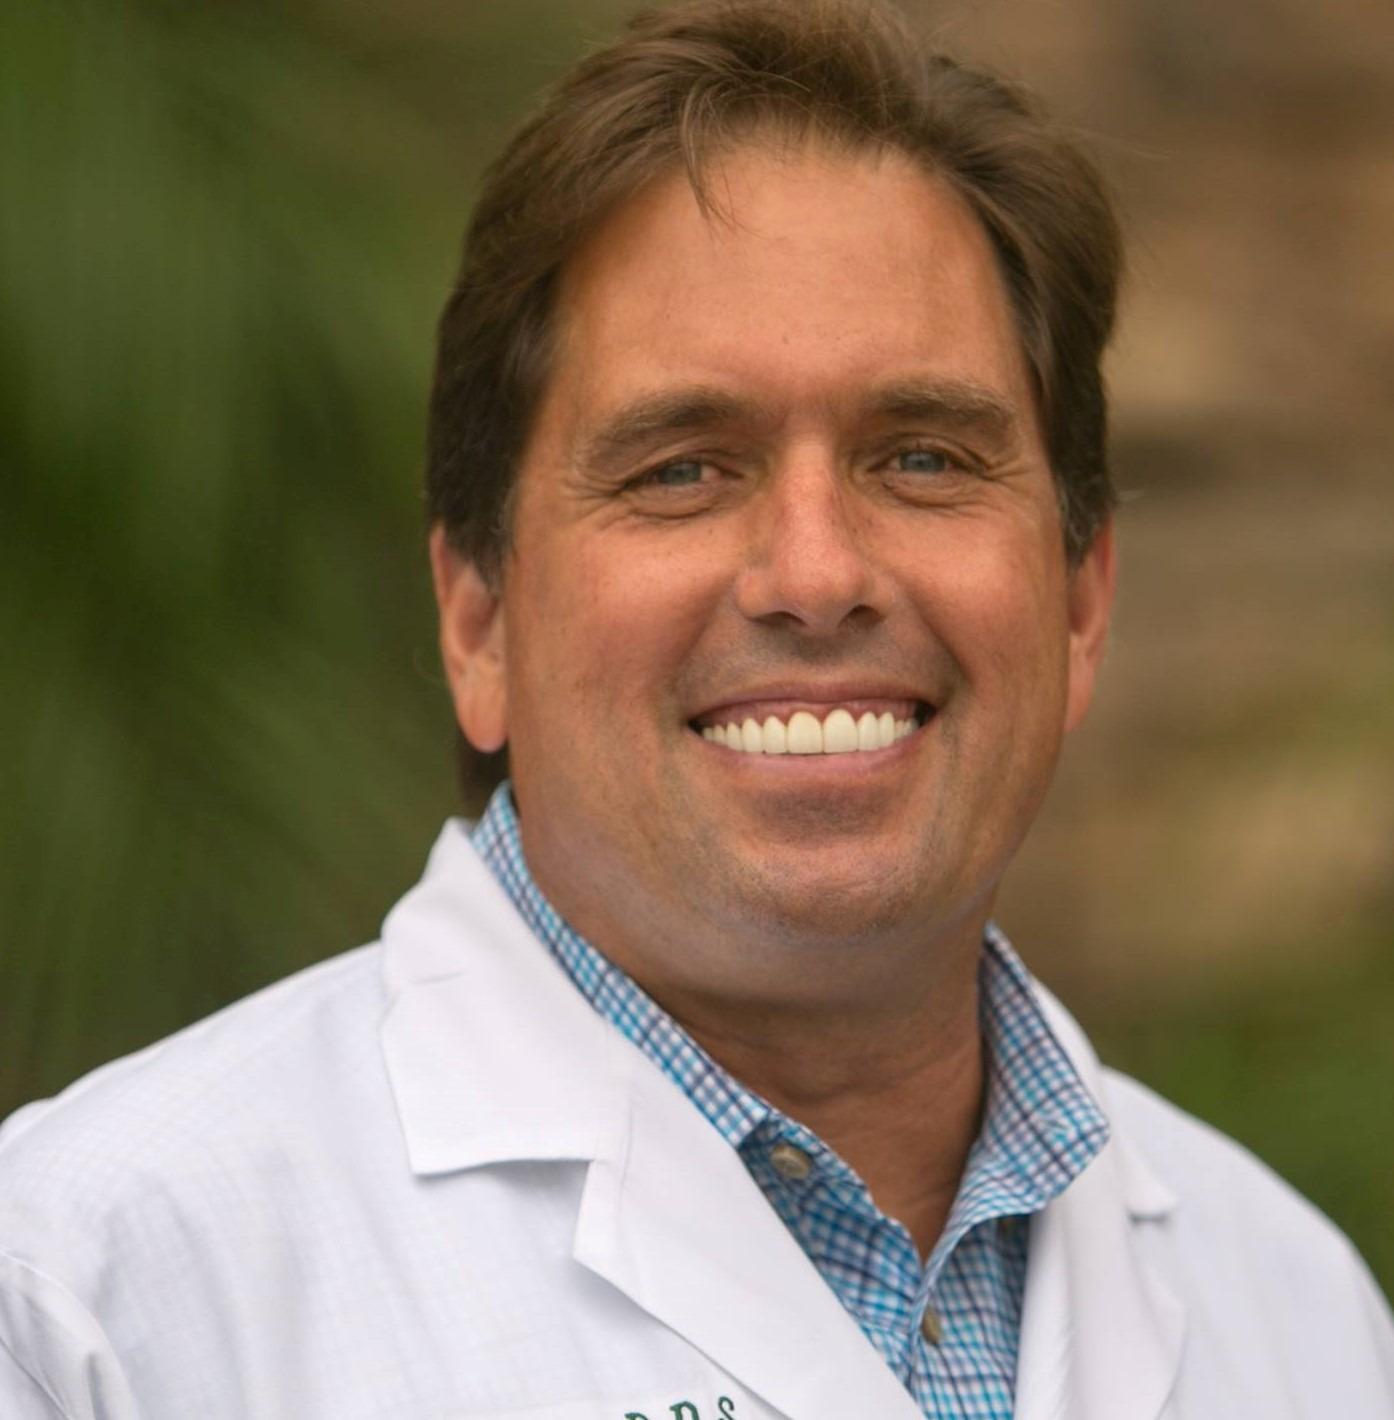 Stephen-Tassone-dentist